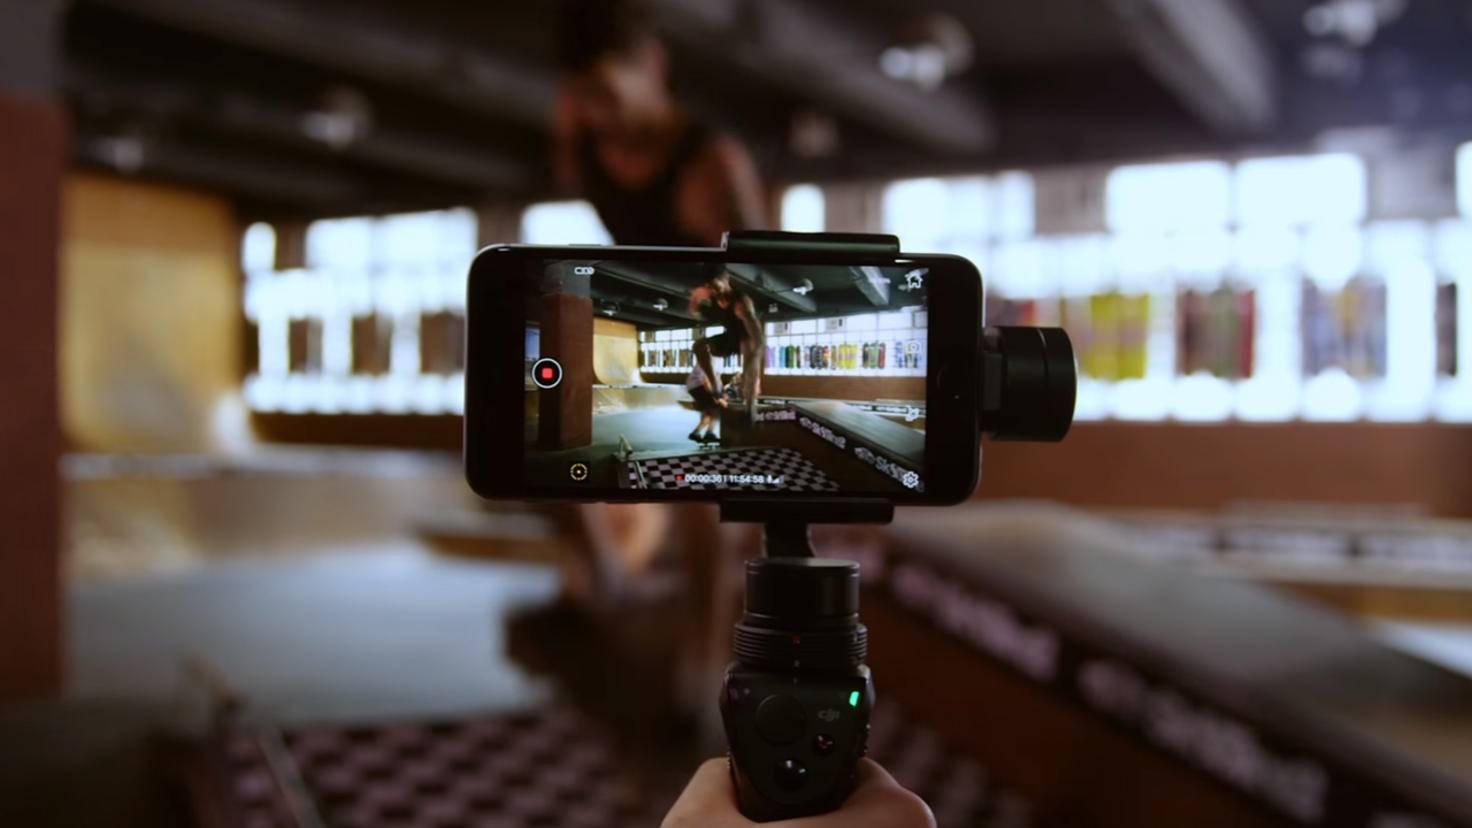 iPhone Videos 5